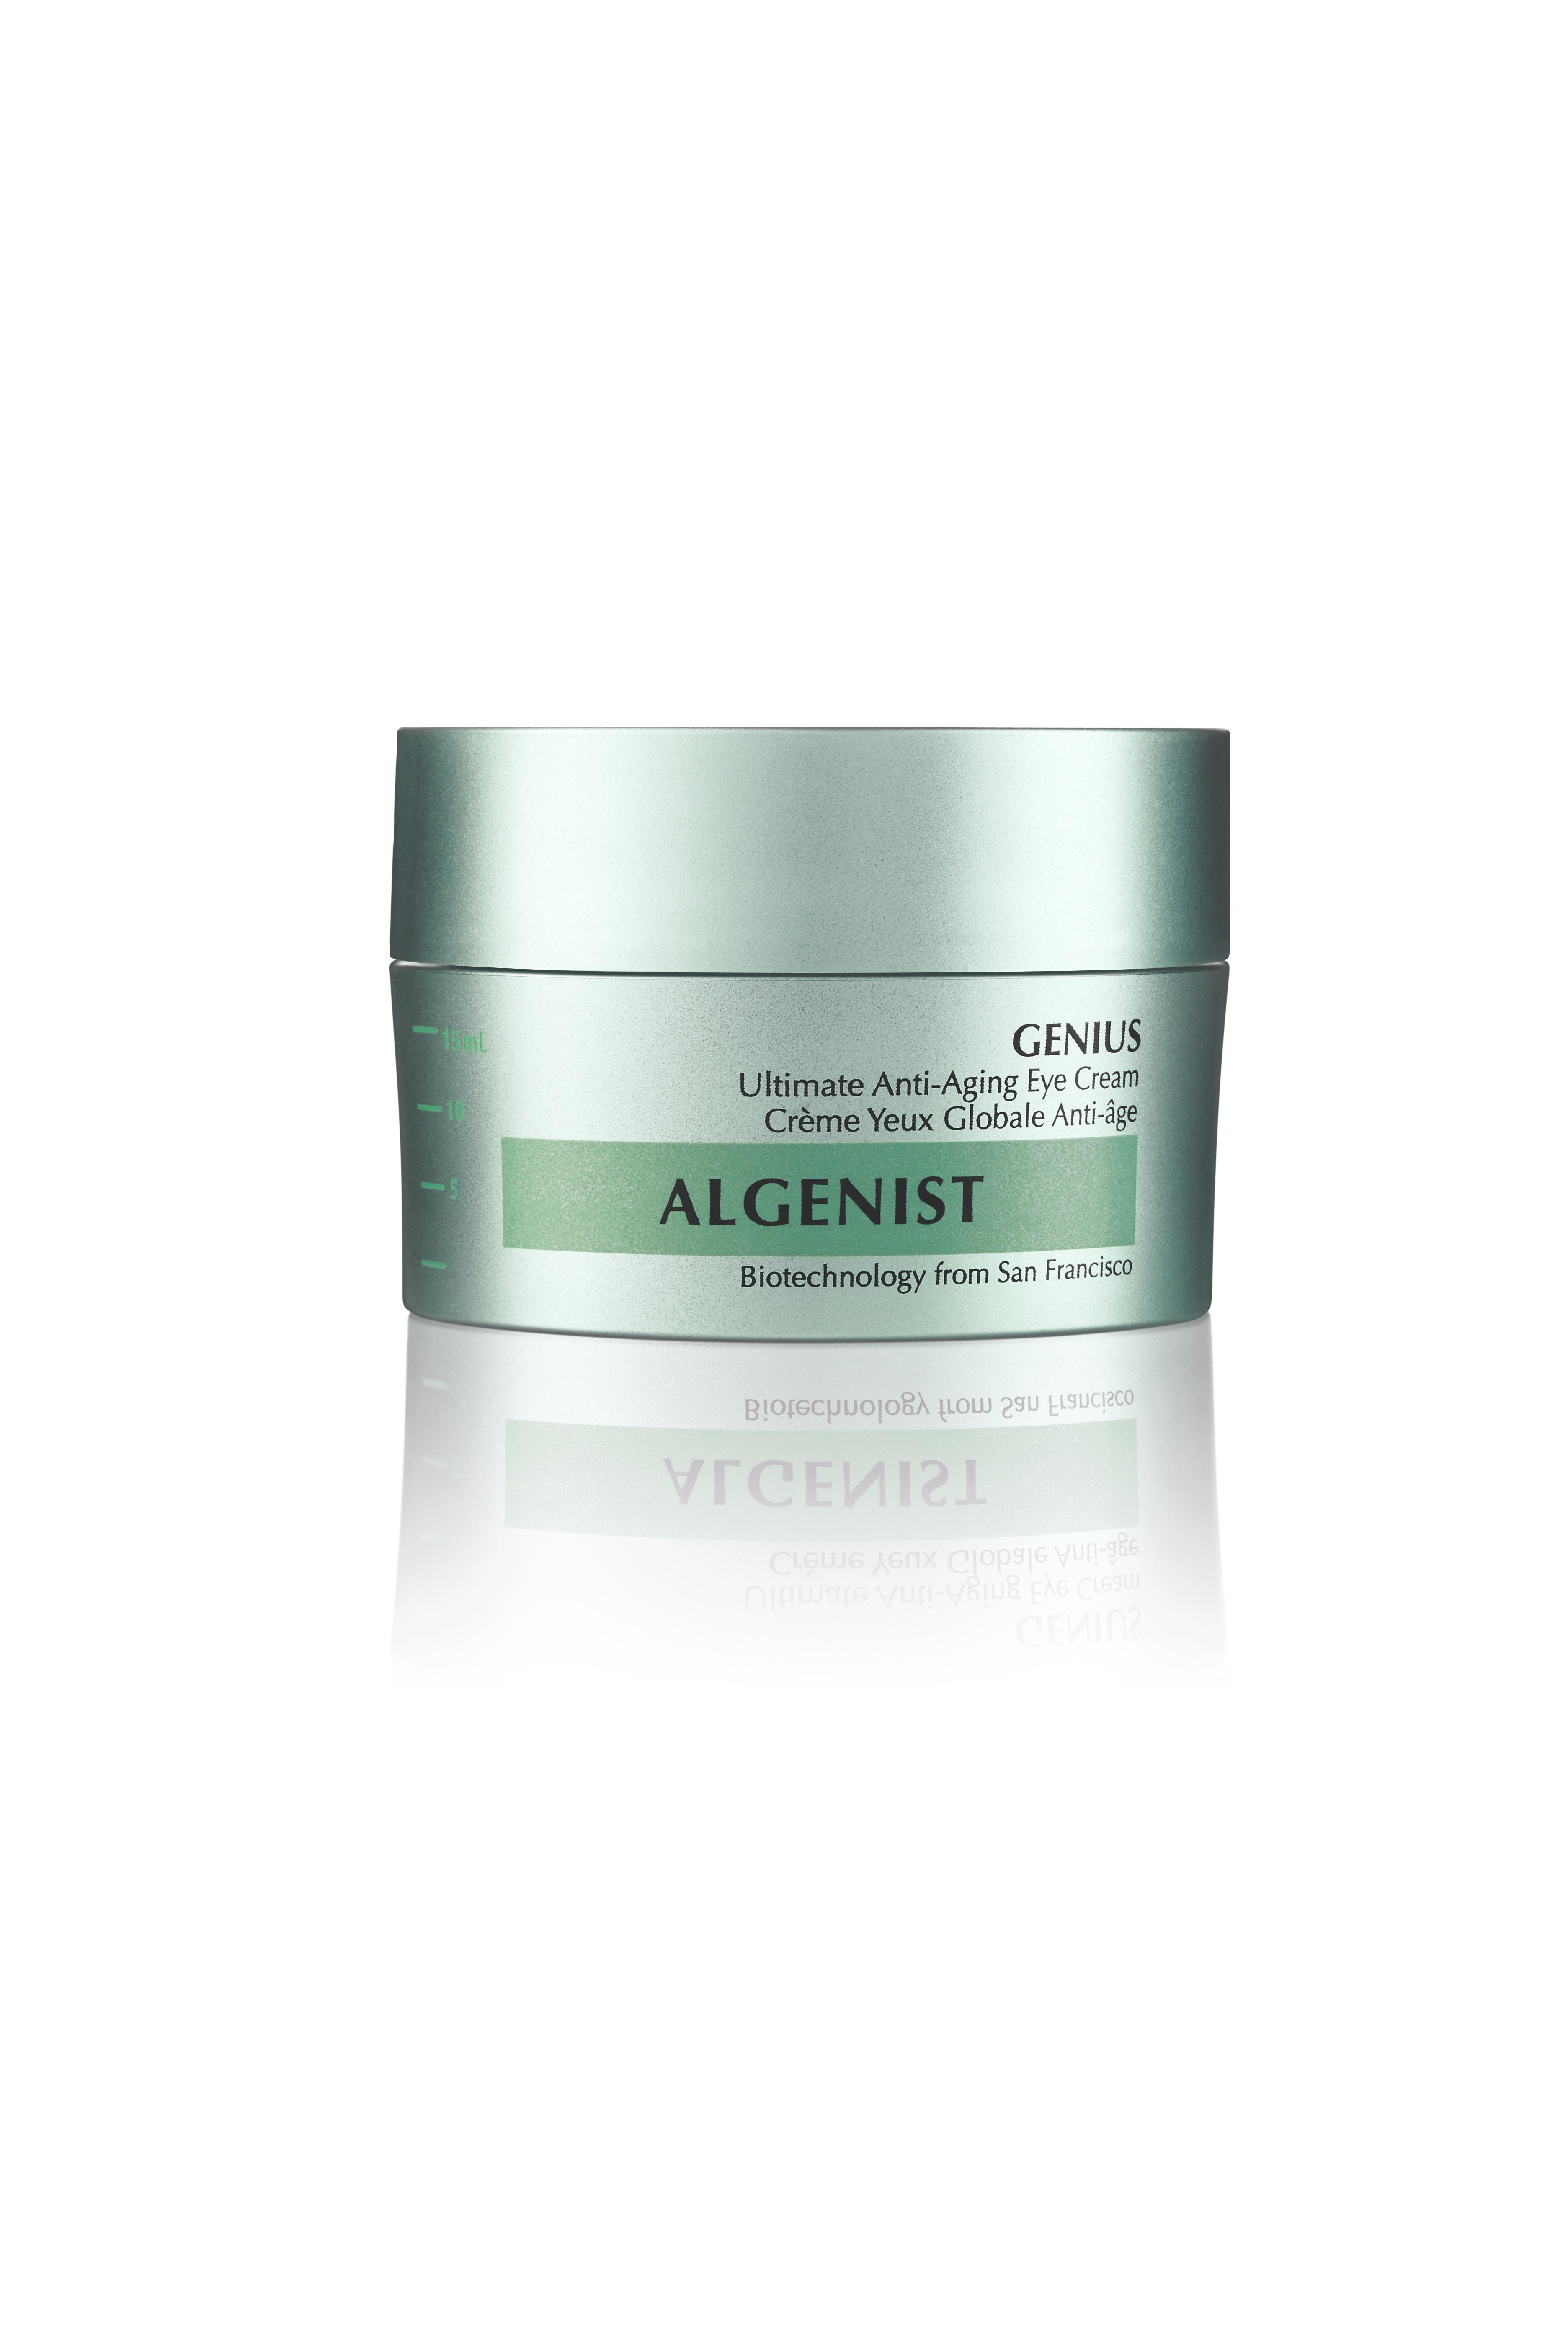 Algenist Genius Ultimate Anti-Aging Eye Cream, 15 ml